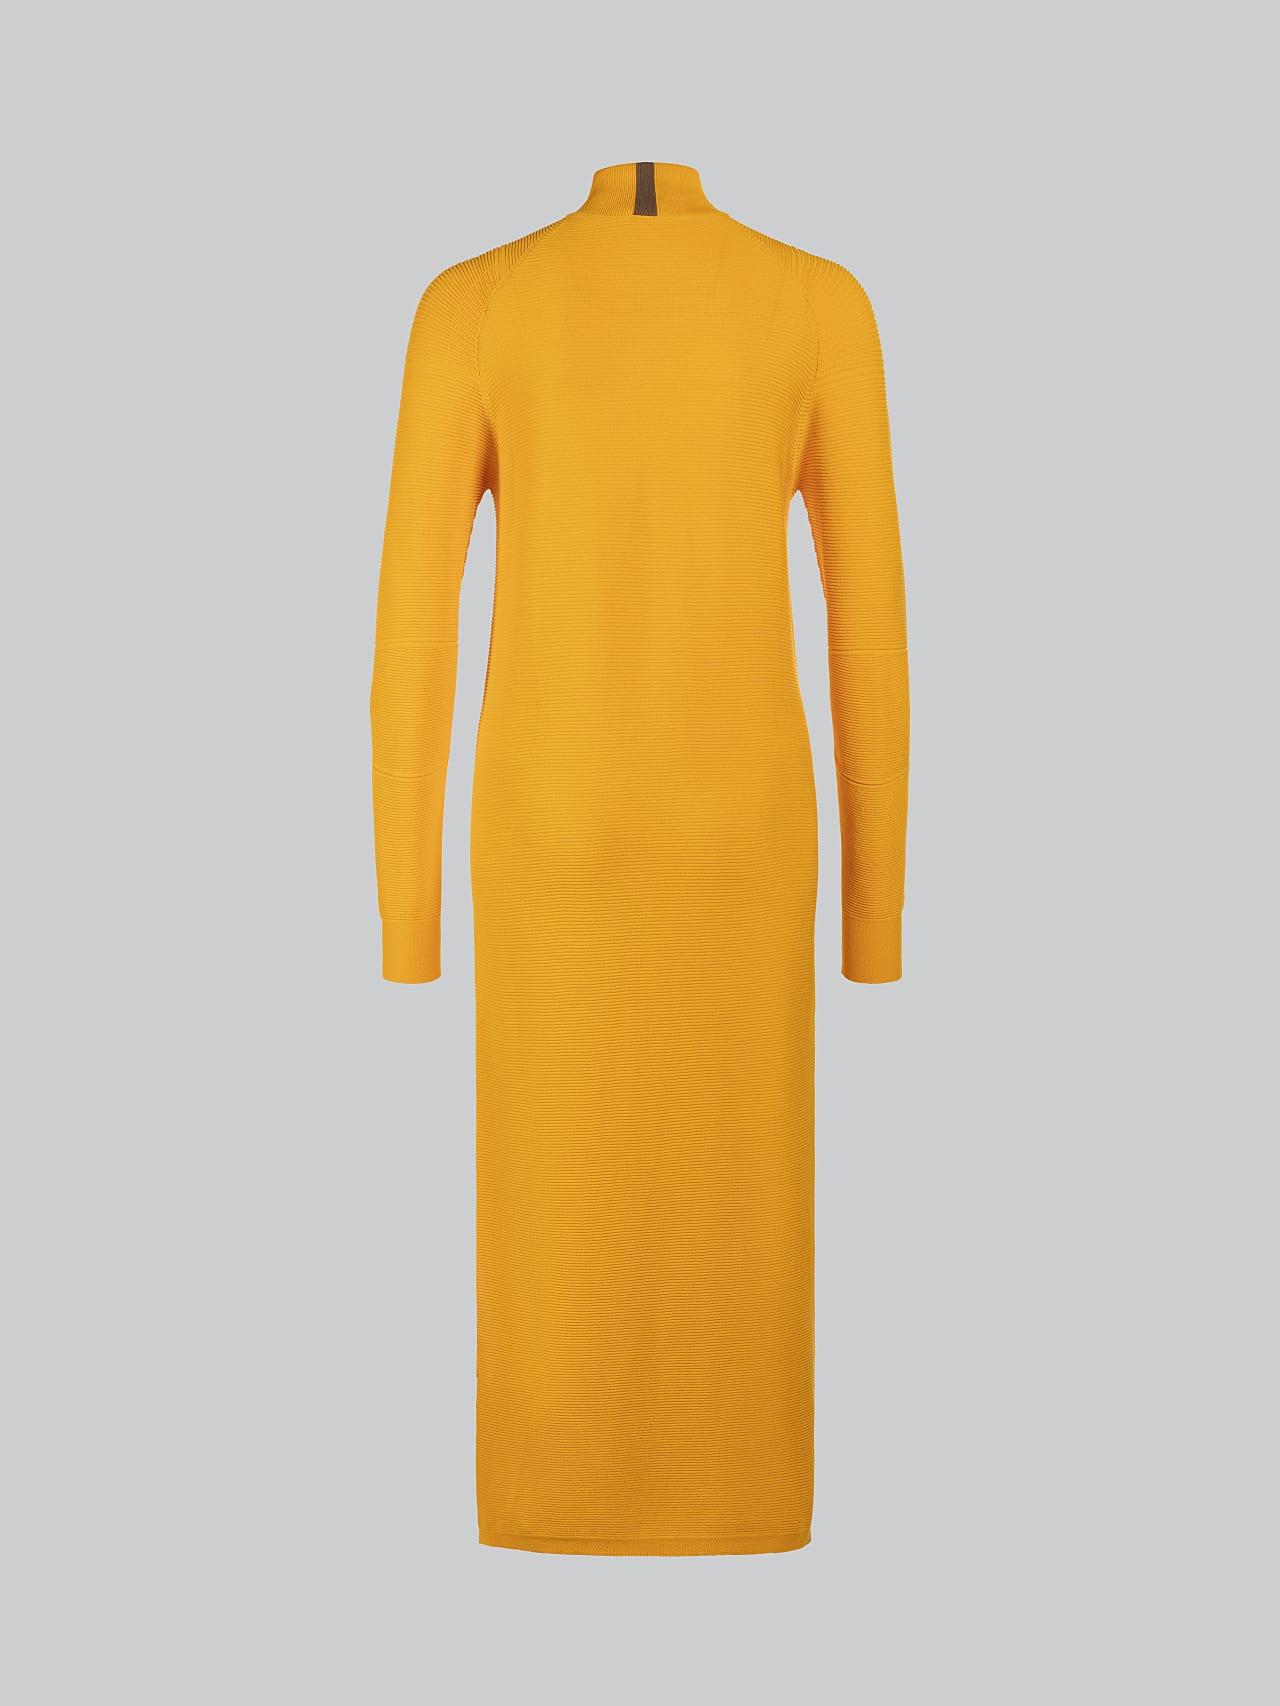 FOXEE V1.Y5.02 Seamless 3D Knit Mock-Neck Dress yellow Left Alpha Tauri